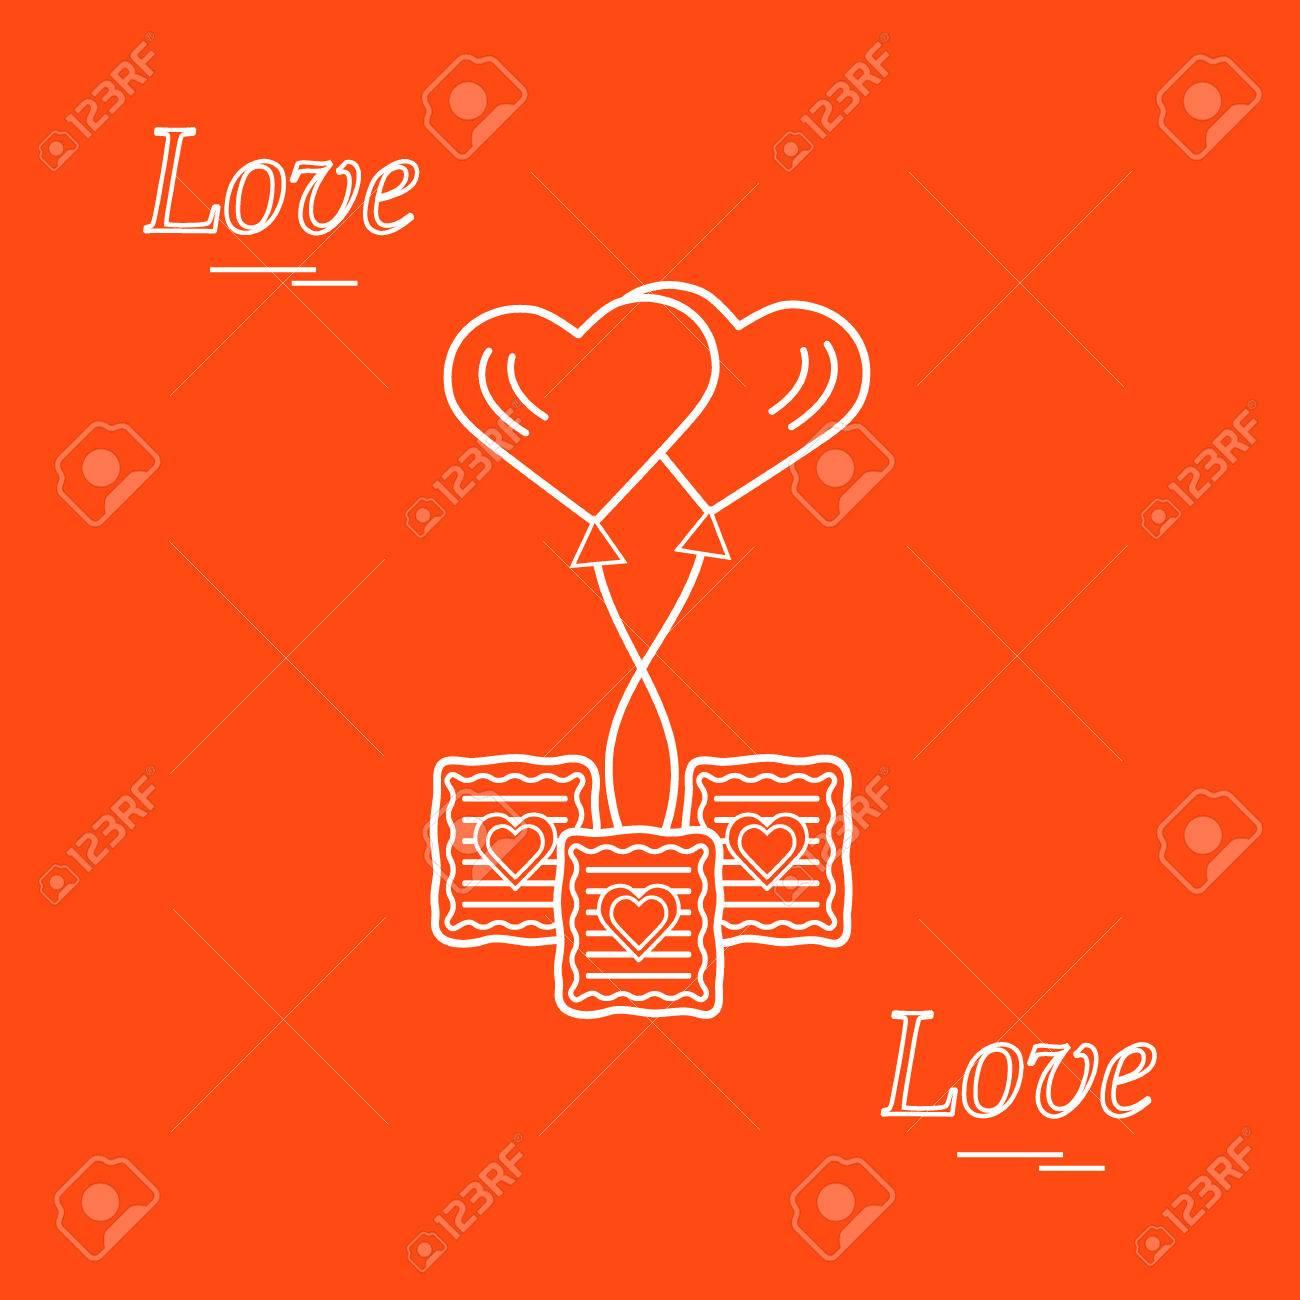 Cute vector illustration of love symbols heart air balloon icon cute vector illustration of love symbols heart air balloon icon and three cookies romantic buycottarizona Gallery